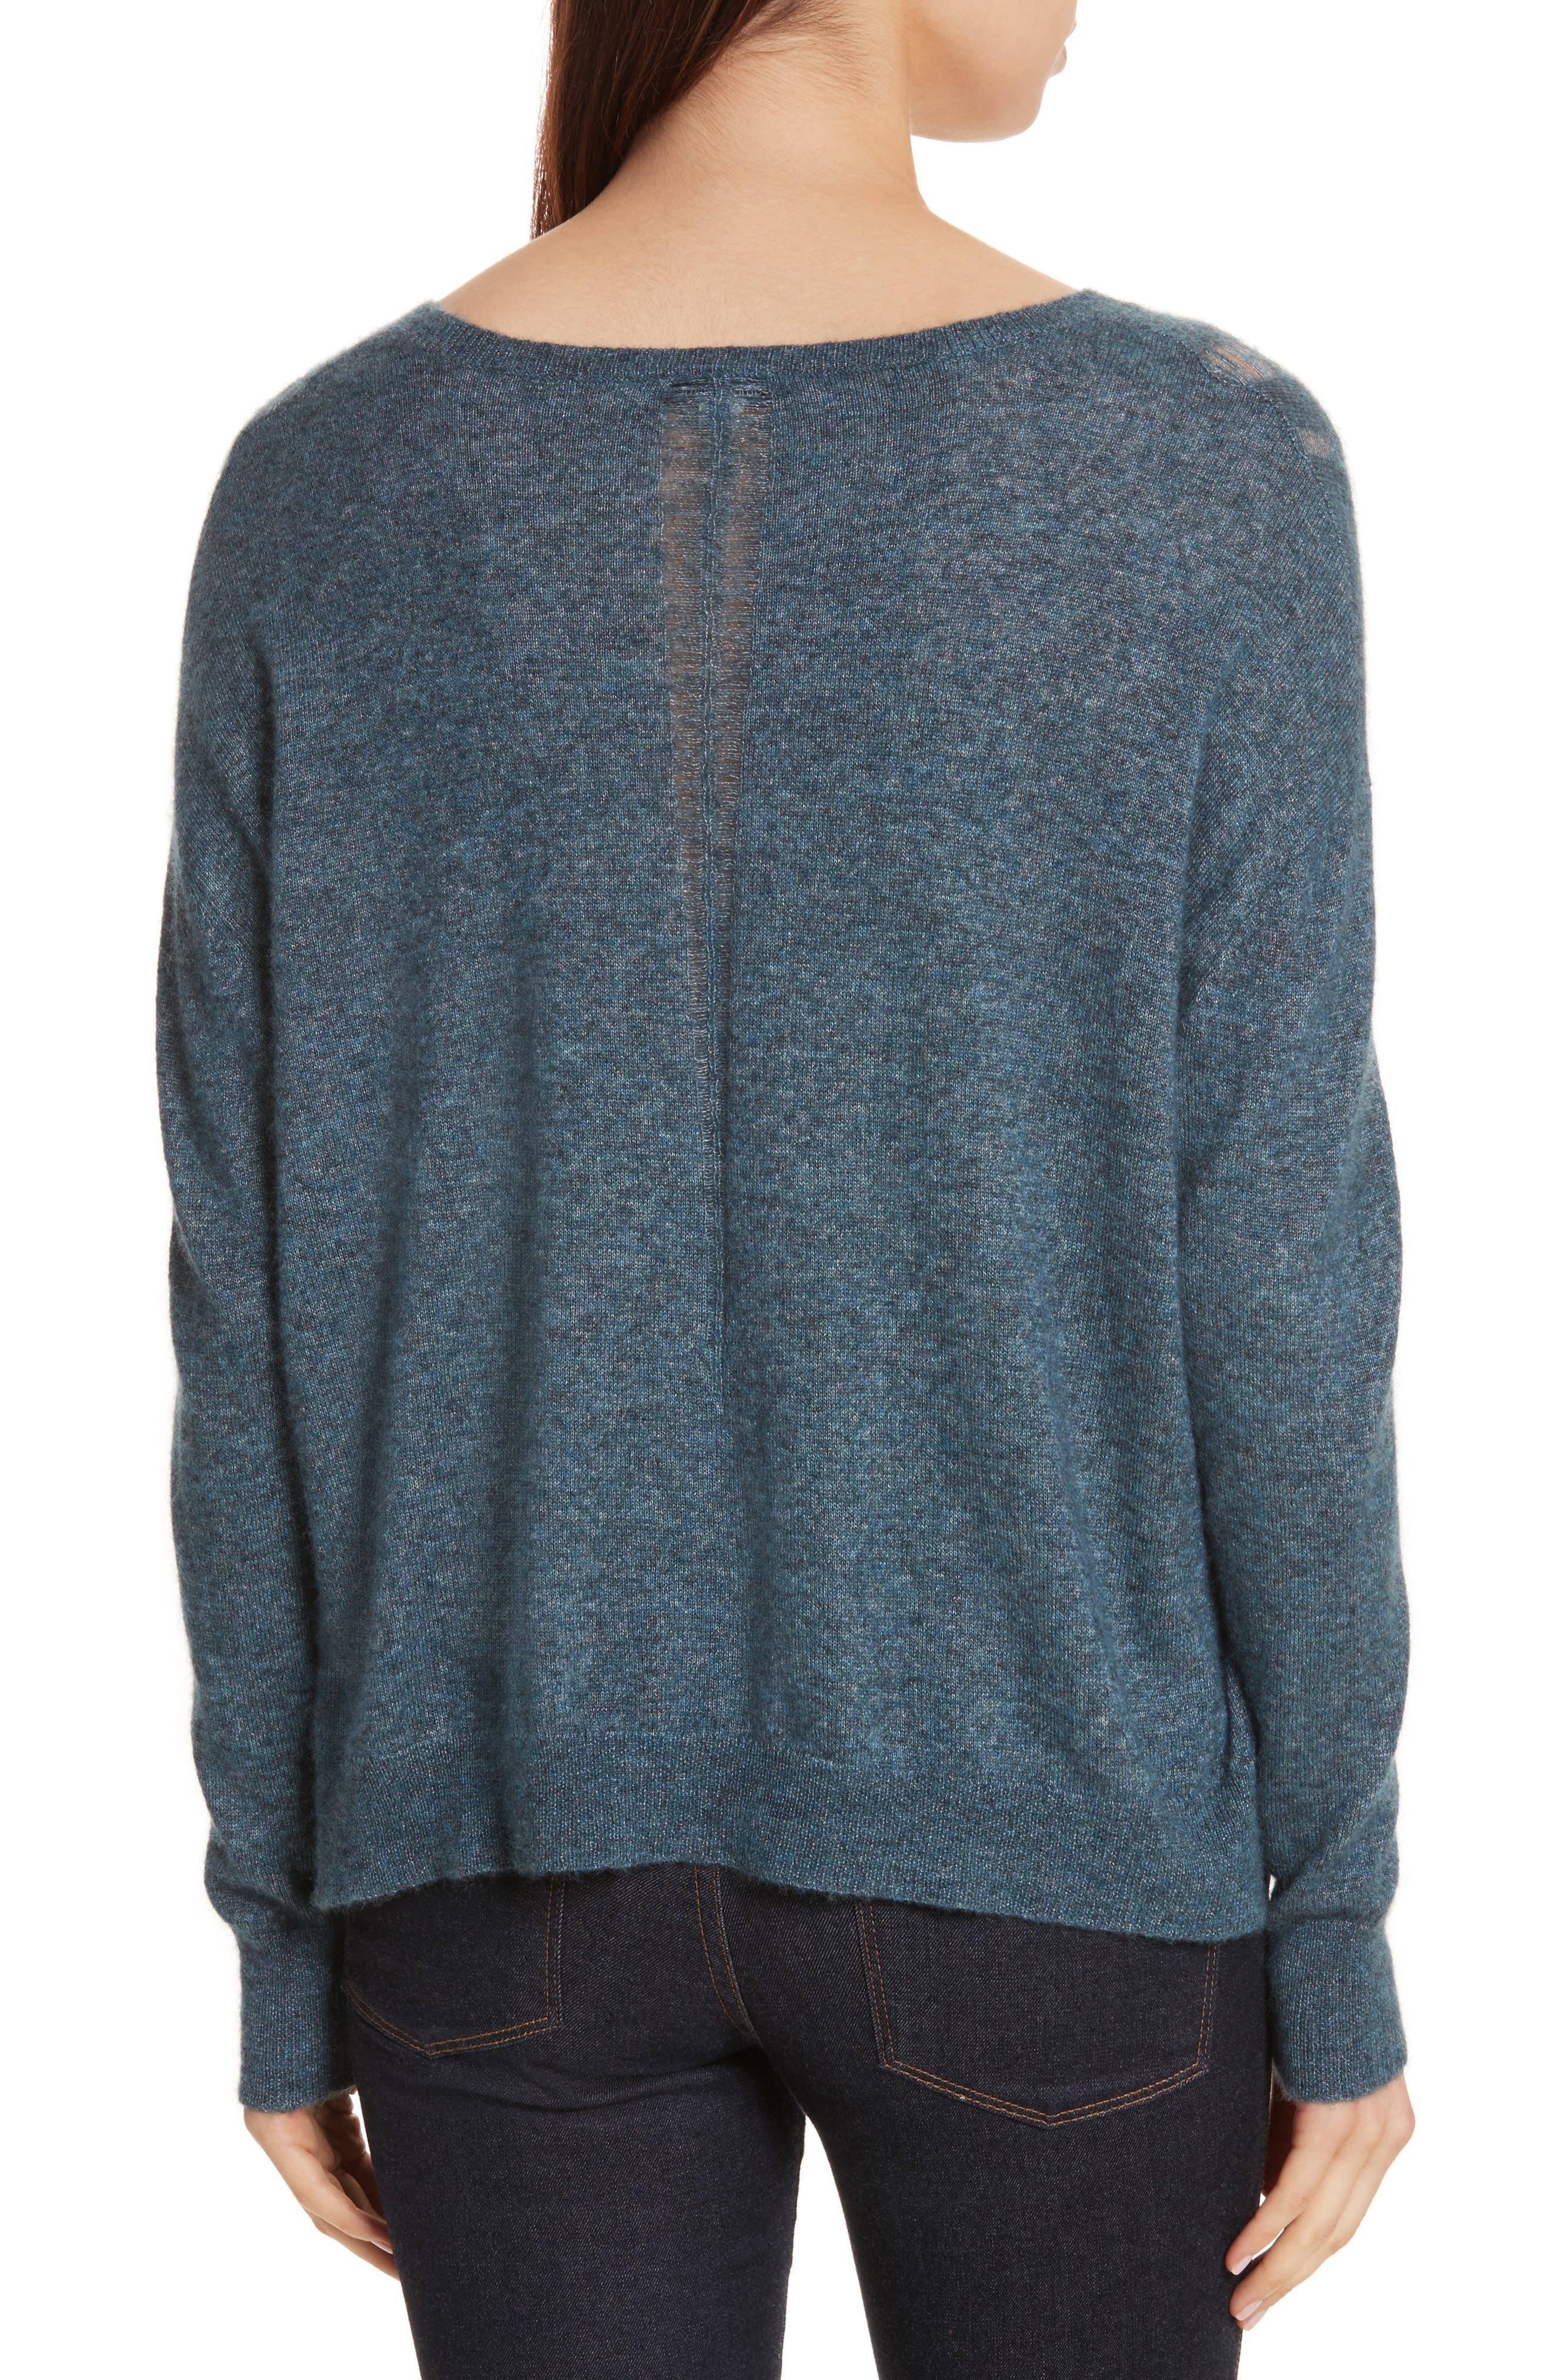 Boxy Ladder Stitch Cashmere & Silk Sweater,                             Alternate thumbnail 2, color,                             256